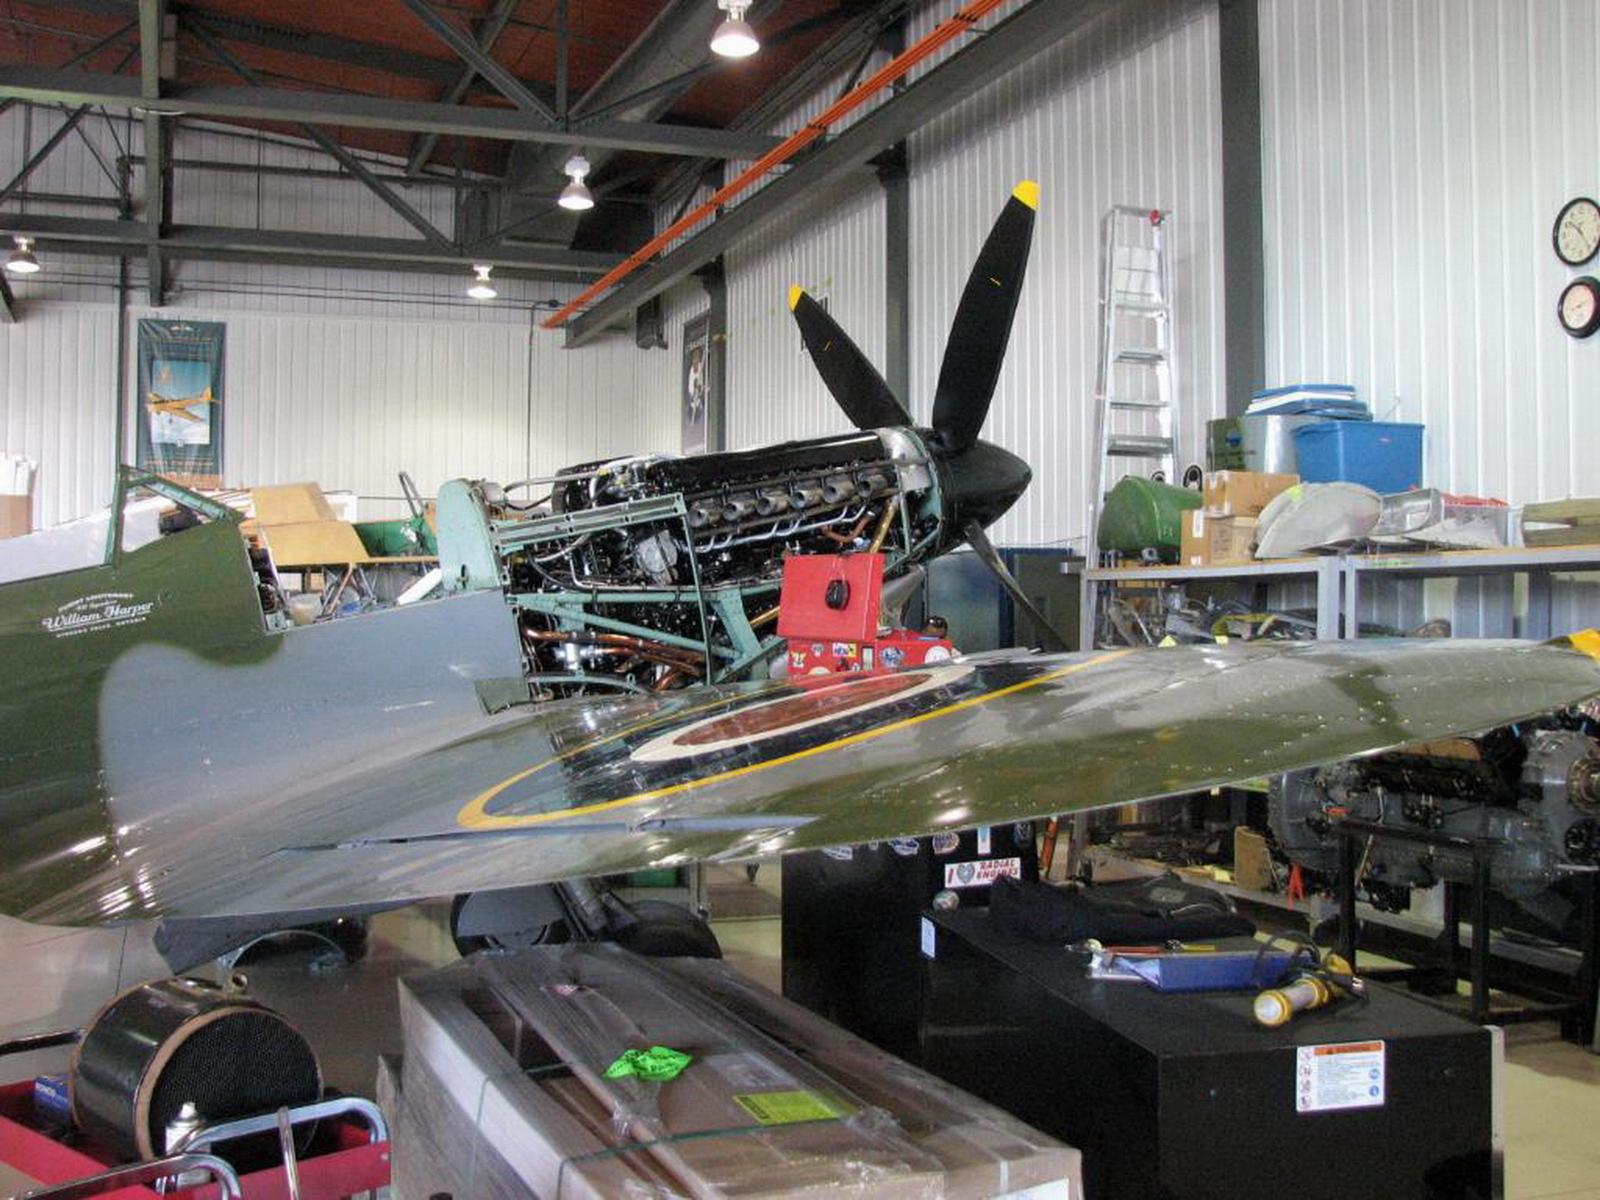 ВАЛК! Supermarine Spitfire Mk XVIe F614a43f0cf7